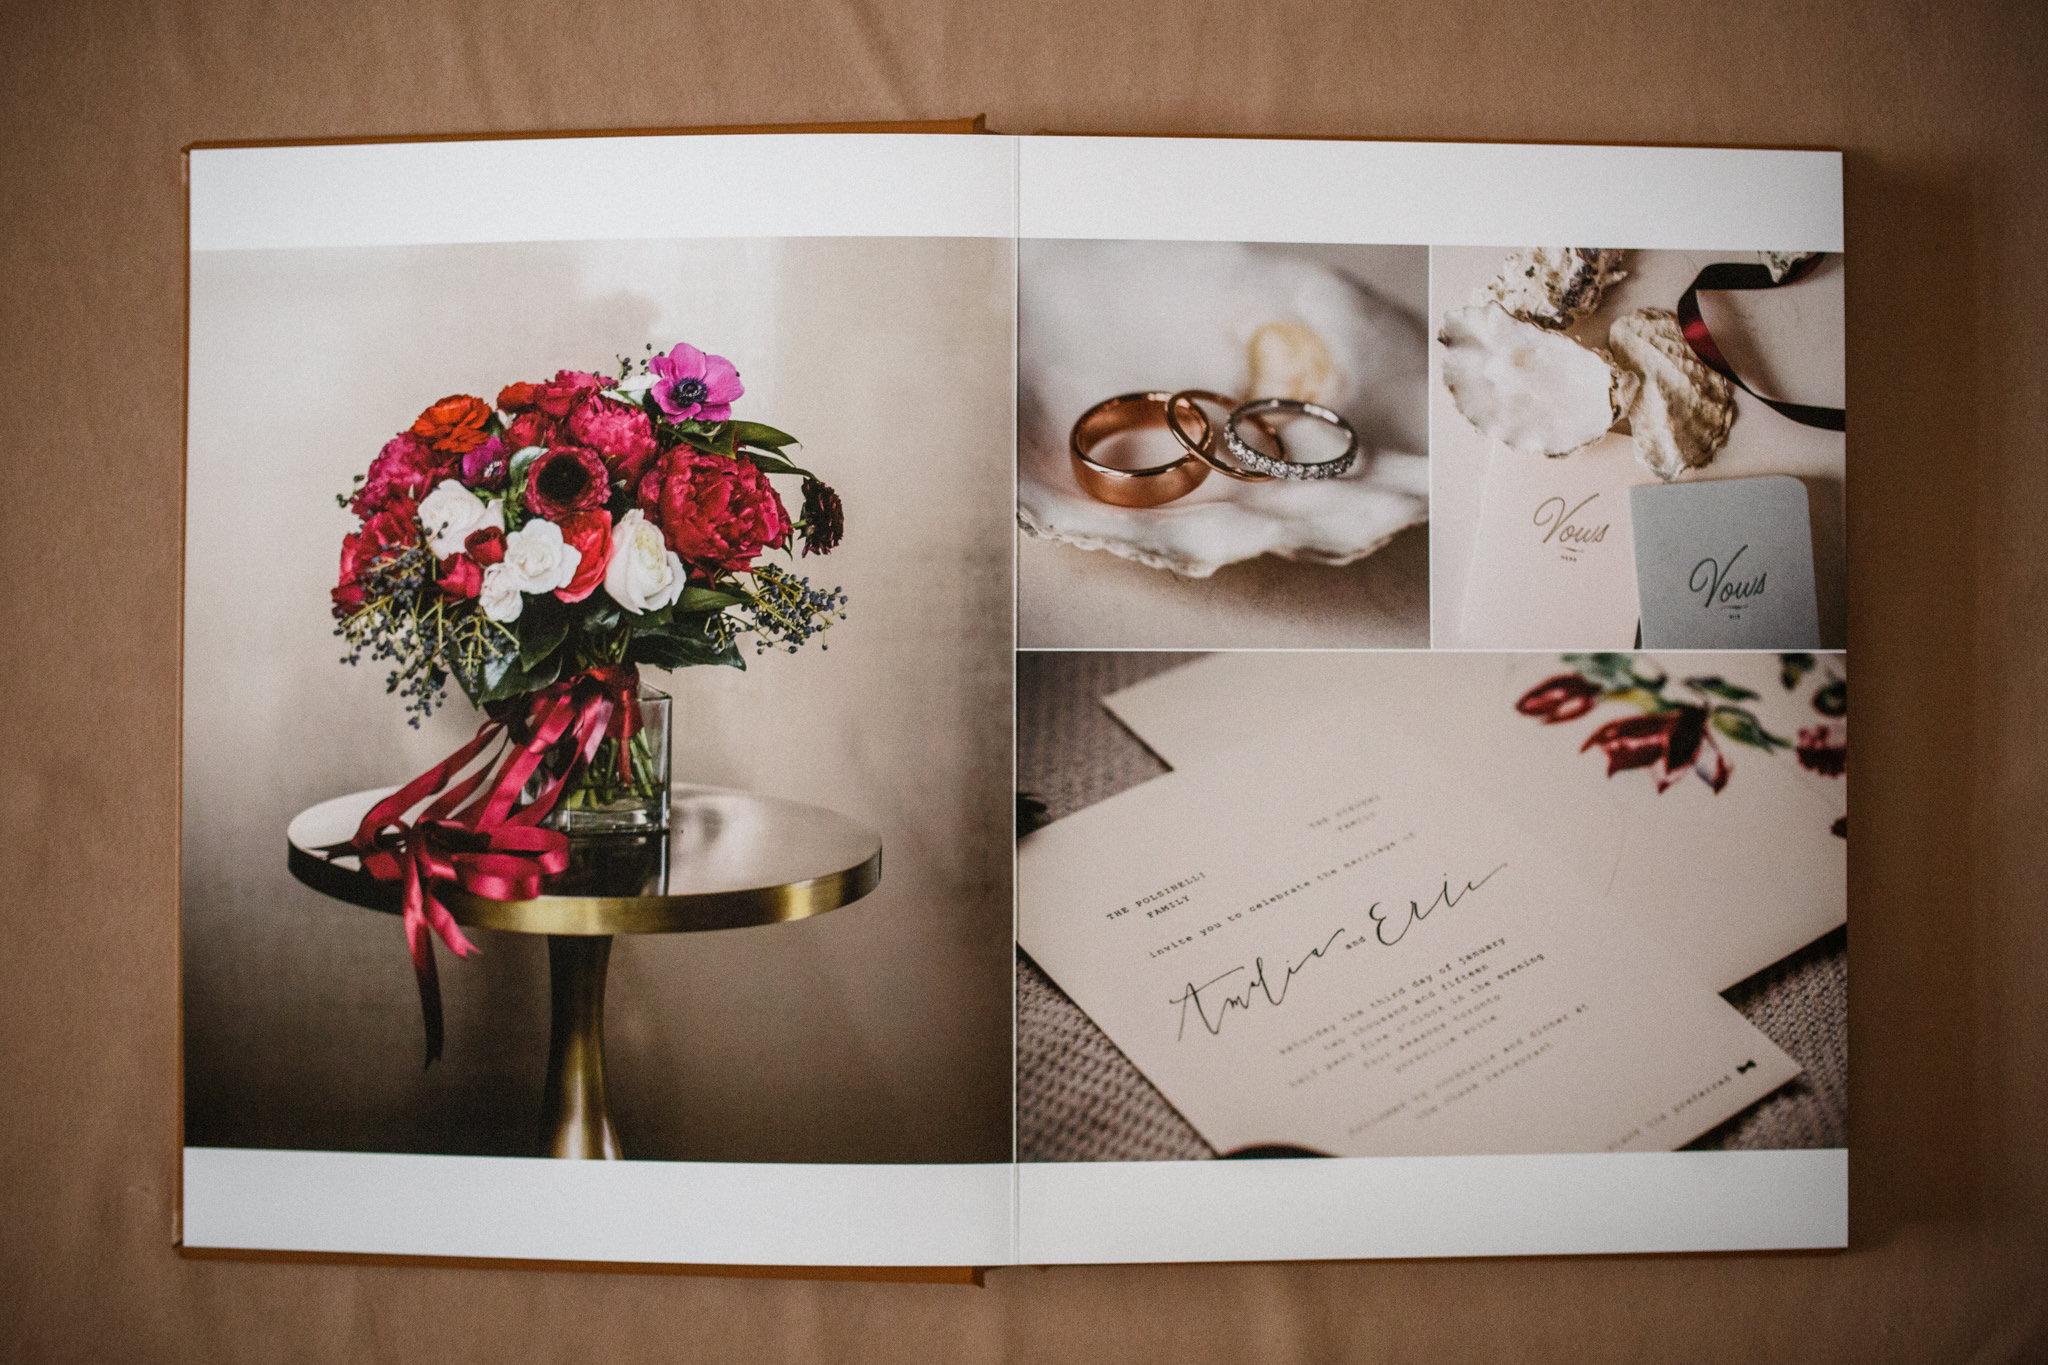 Four Seasons Toronto wedding album.